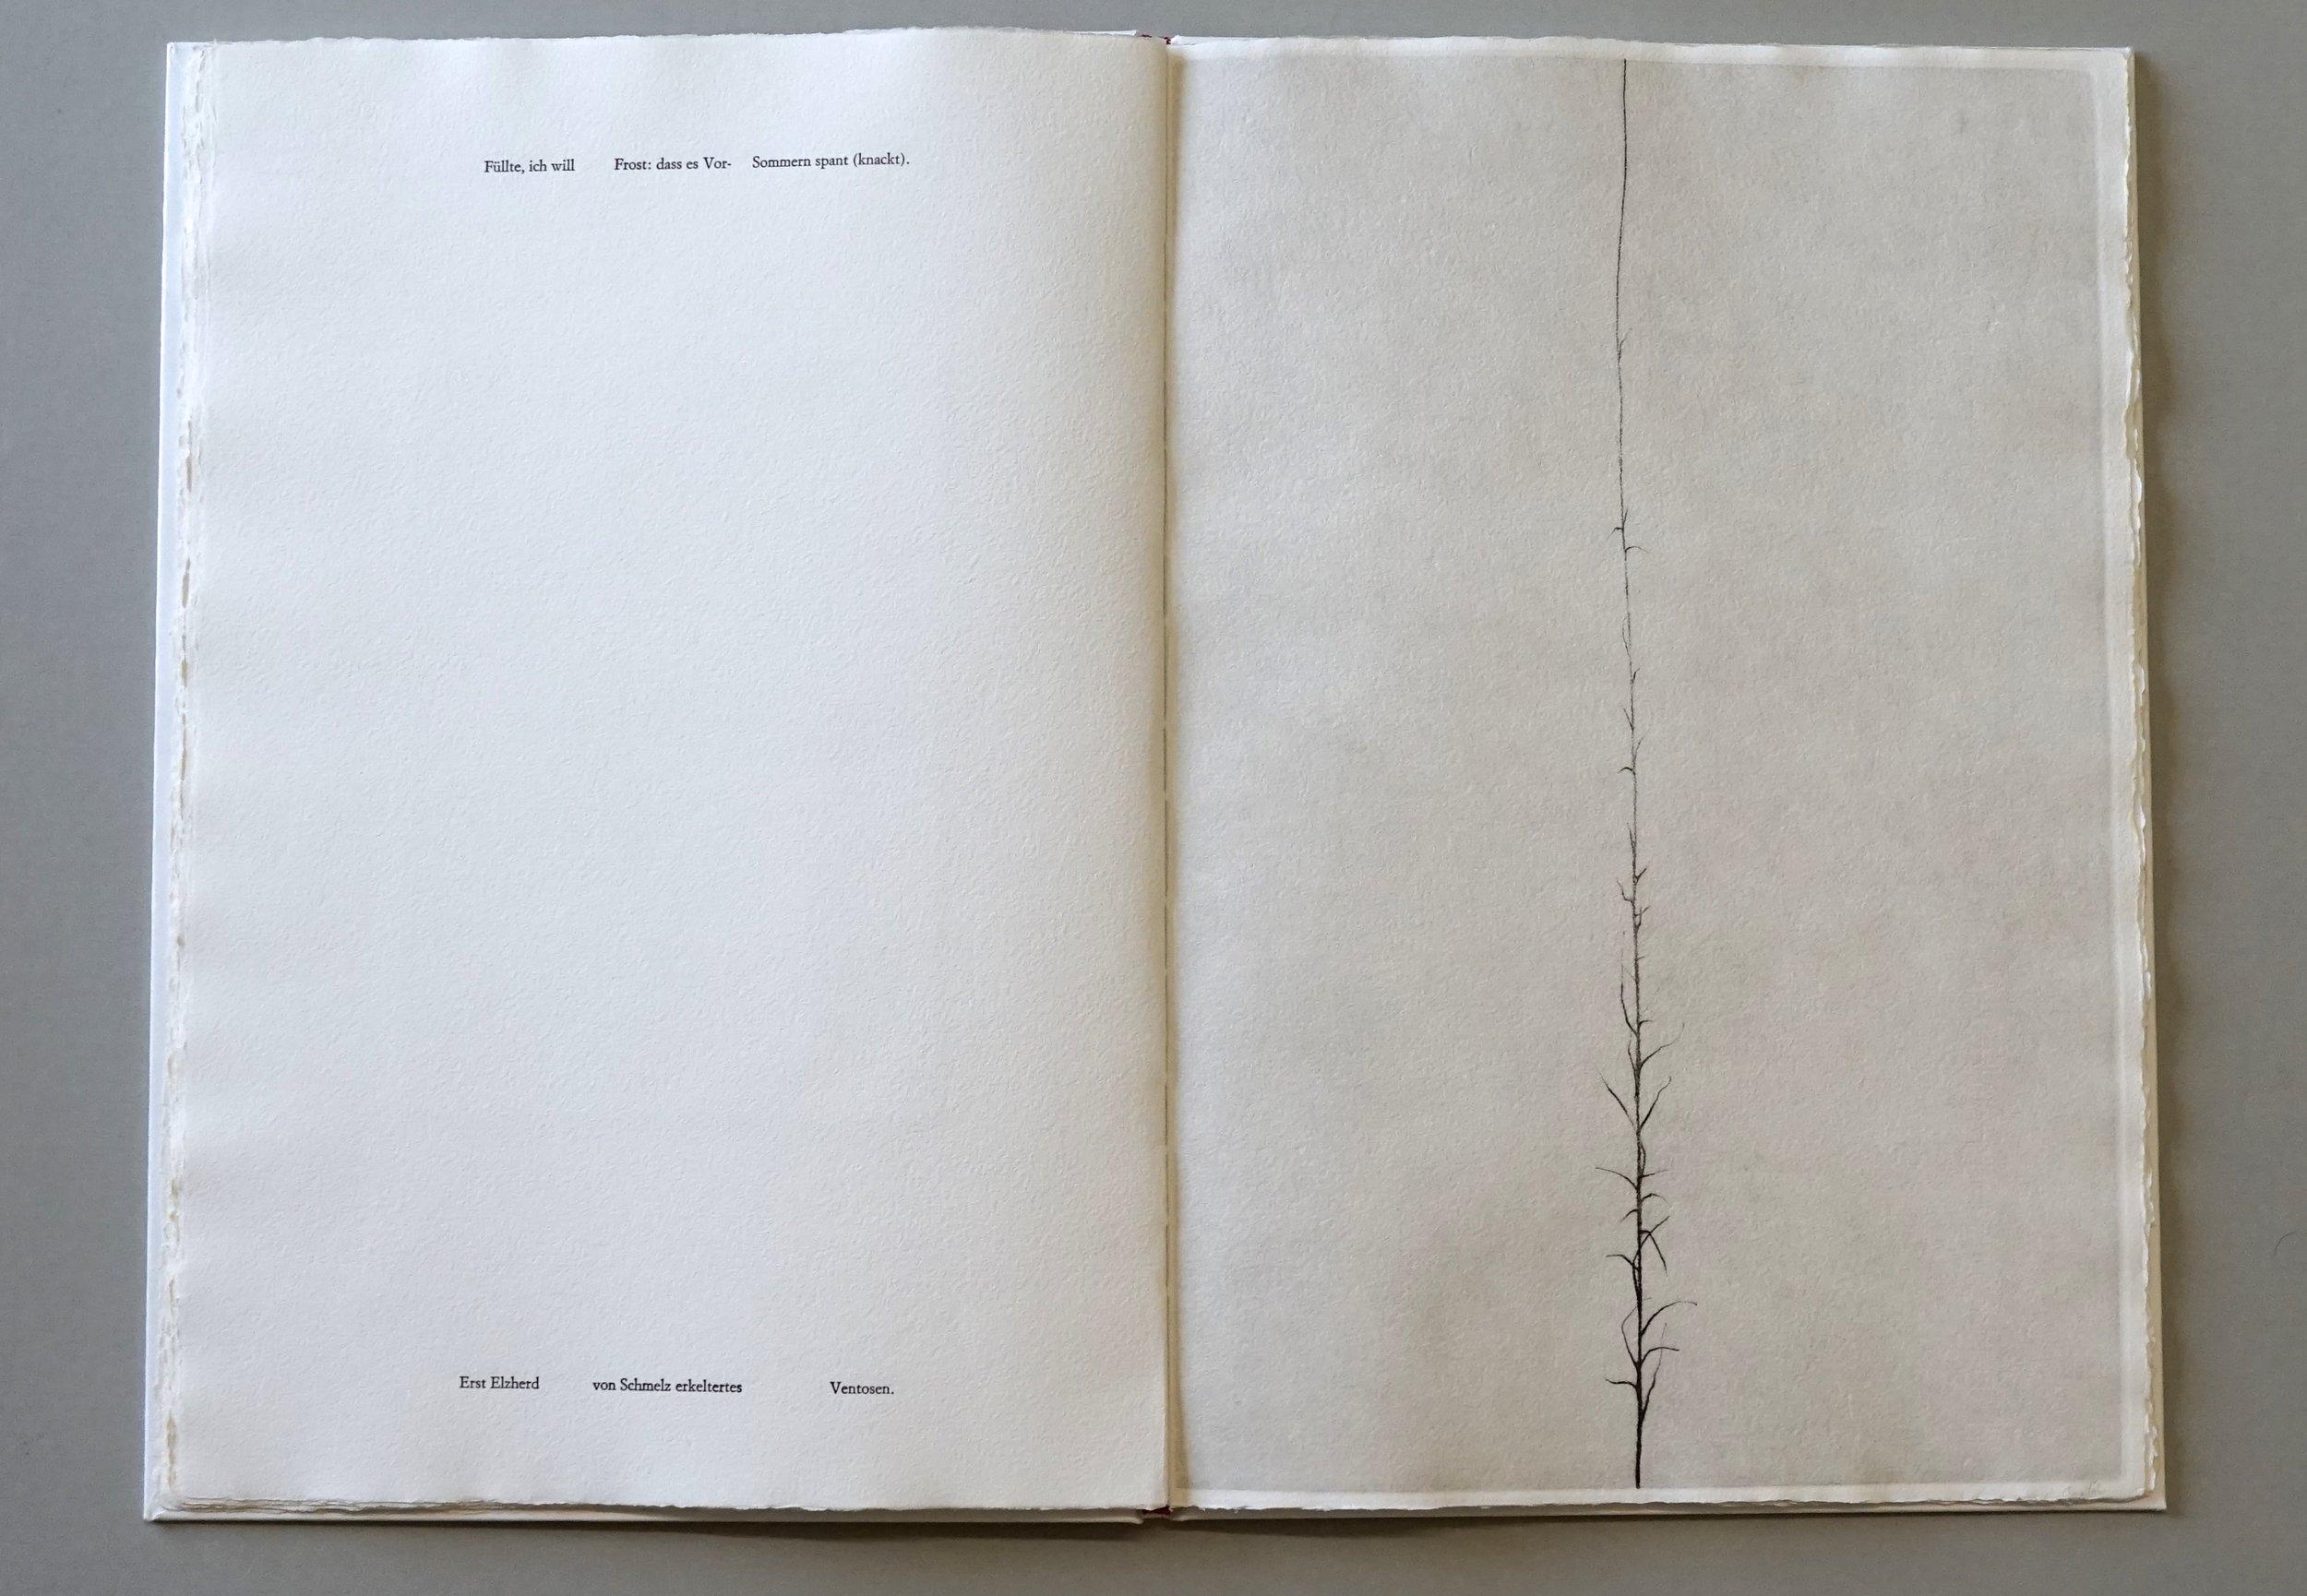 NICHTS VON DEM, WAS ICH GESEHEN HABE Four soft grounds and three etchings by CHRISTIANE LÖHR Unpublished poem by OSWALD EGGER , 2004 Artist Book 16 x 11 x 1/2 inches (40.6 x 27.9 x 1.3 cm) Wood case: 17 1/8 x 11 3/4 x 1 1/2 inches (43.5 x 29.8 x 3.8 cm) Edition : 47/50 Edizioni Canopo